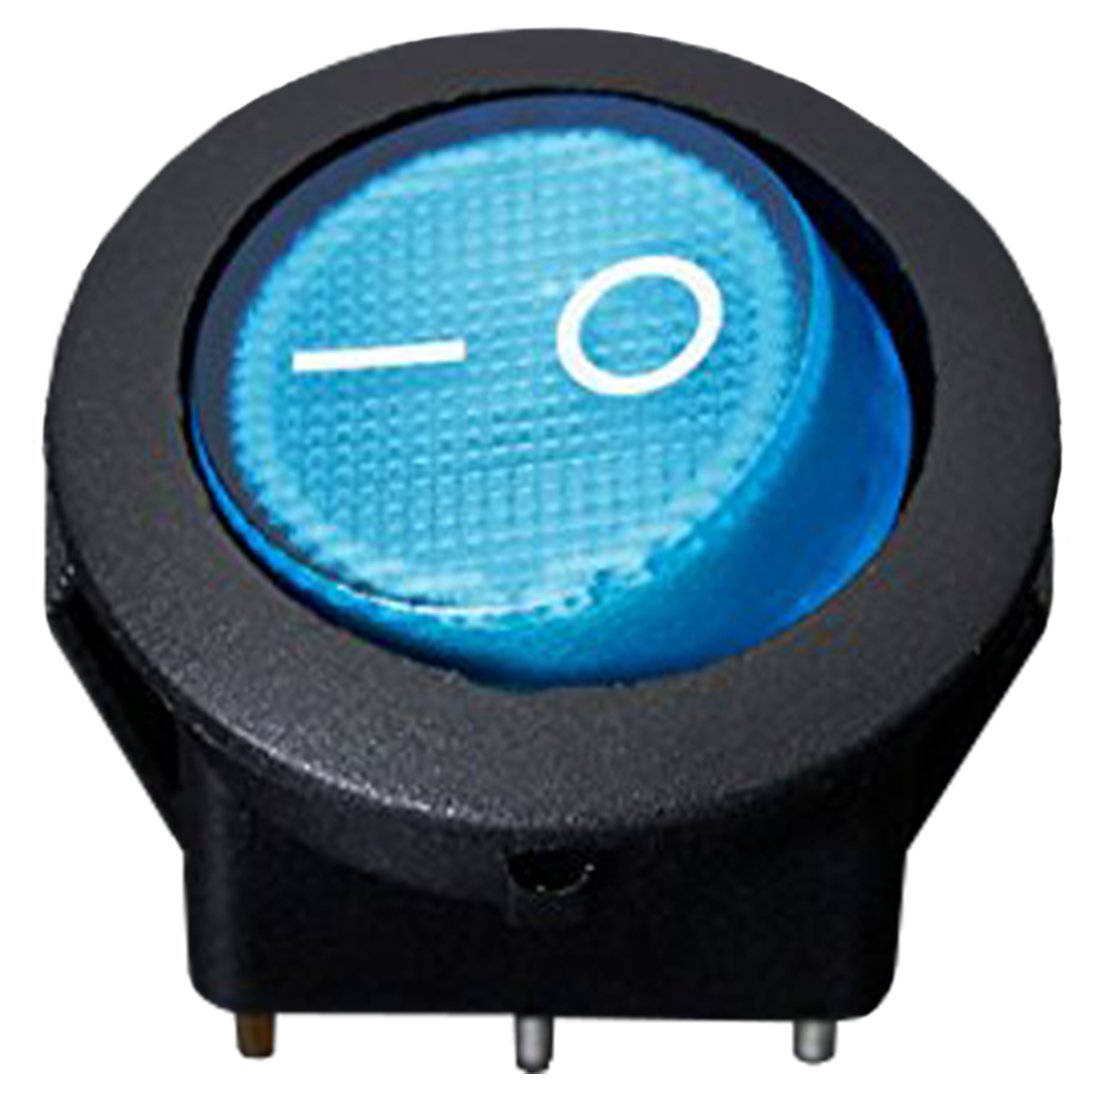 REFURBISHHOUSE 5 X 12V 16A LED Interruptor basculante Bipolar ON//Off SPST para Auto Moto Barco Rojo